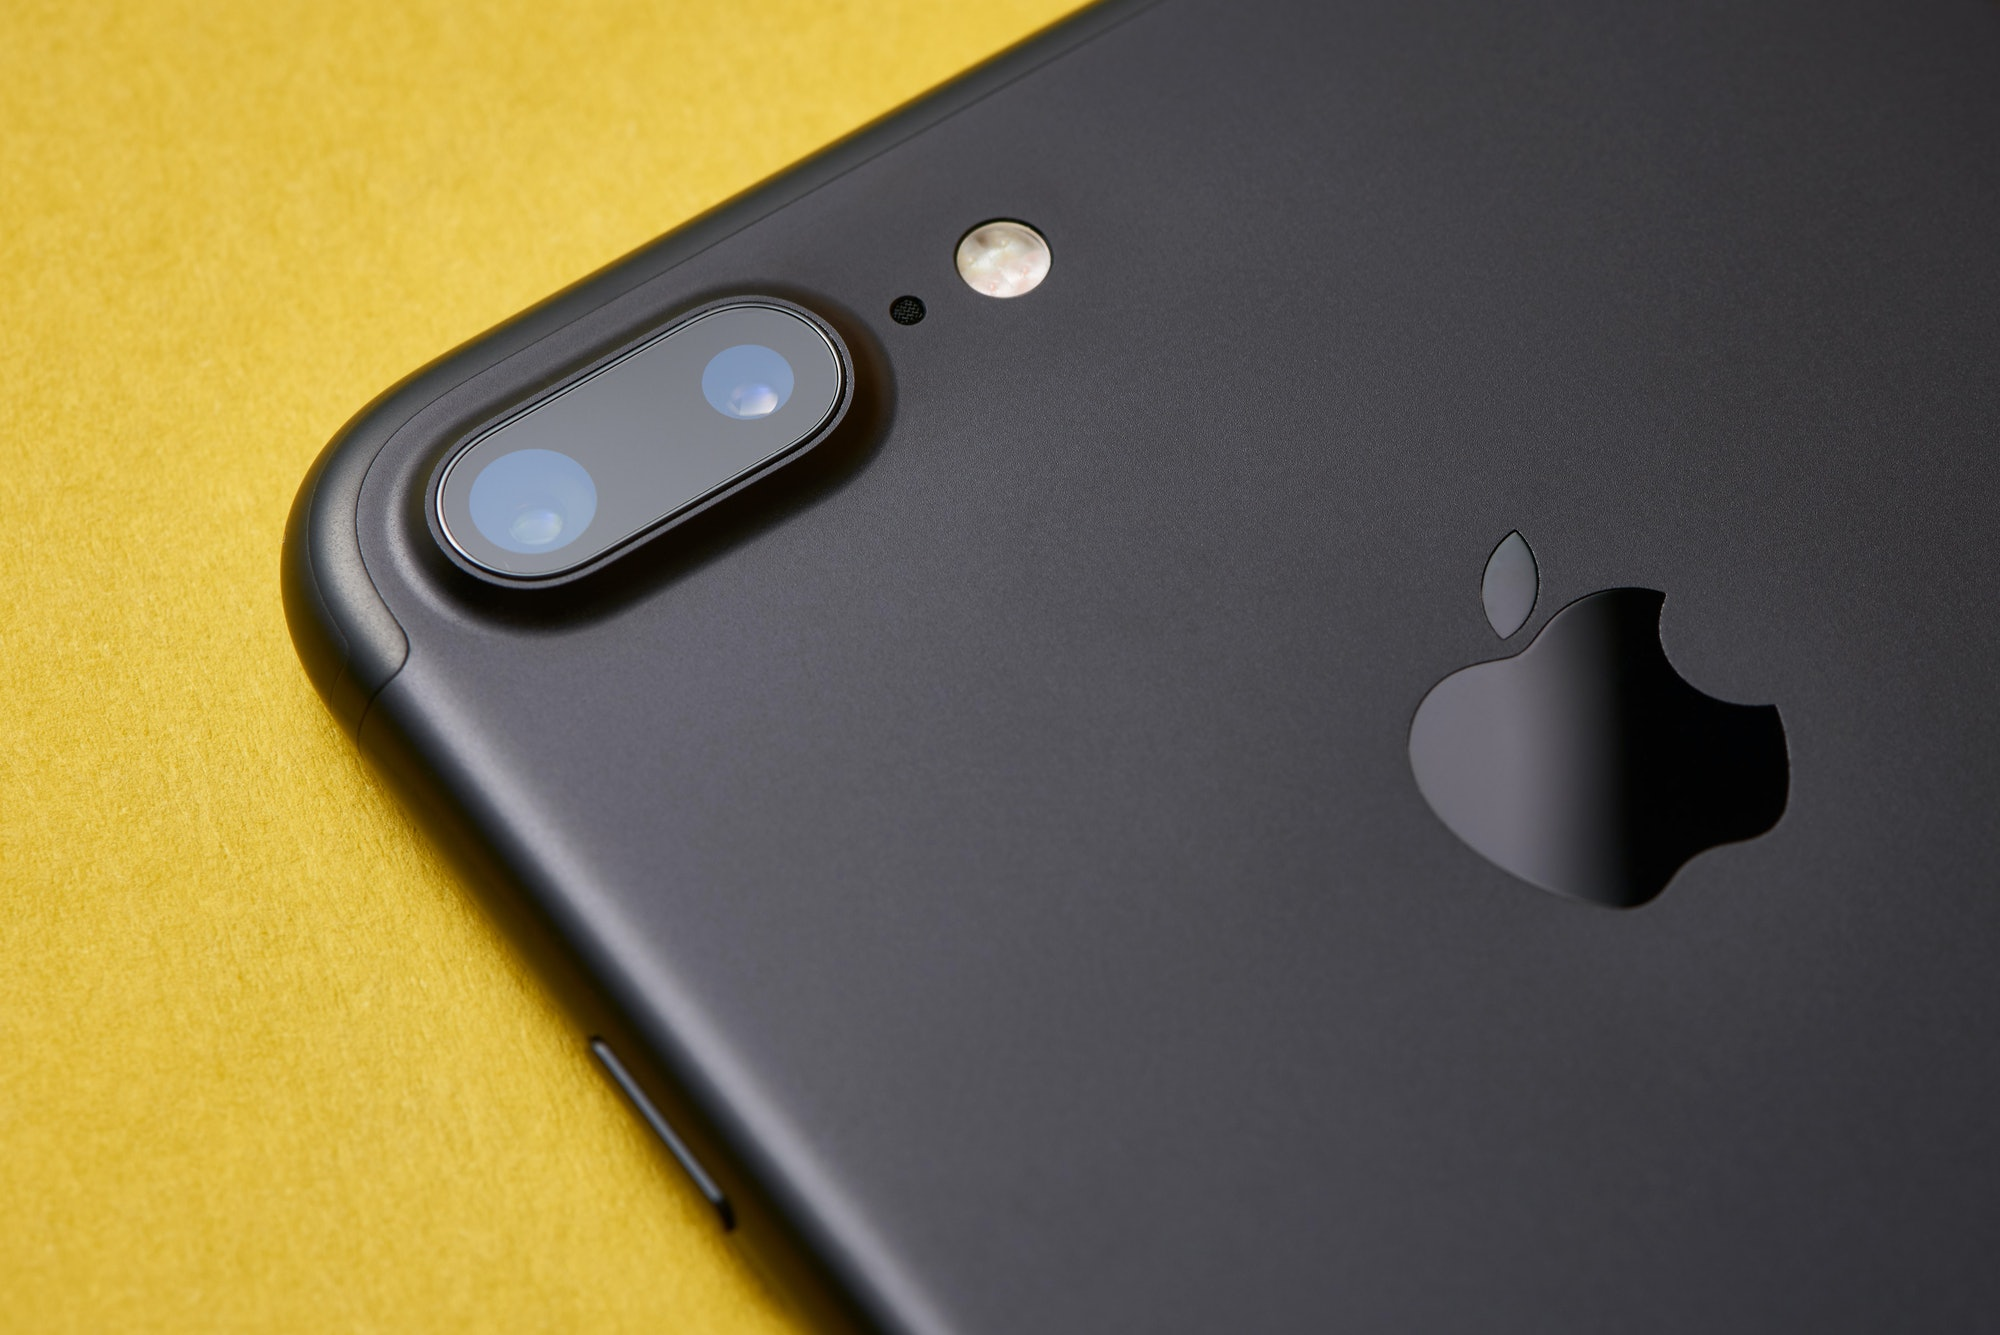 The iPhone 7 Plus' dual-lens camera.